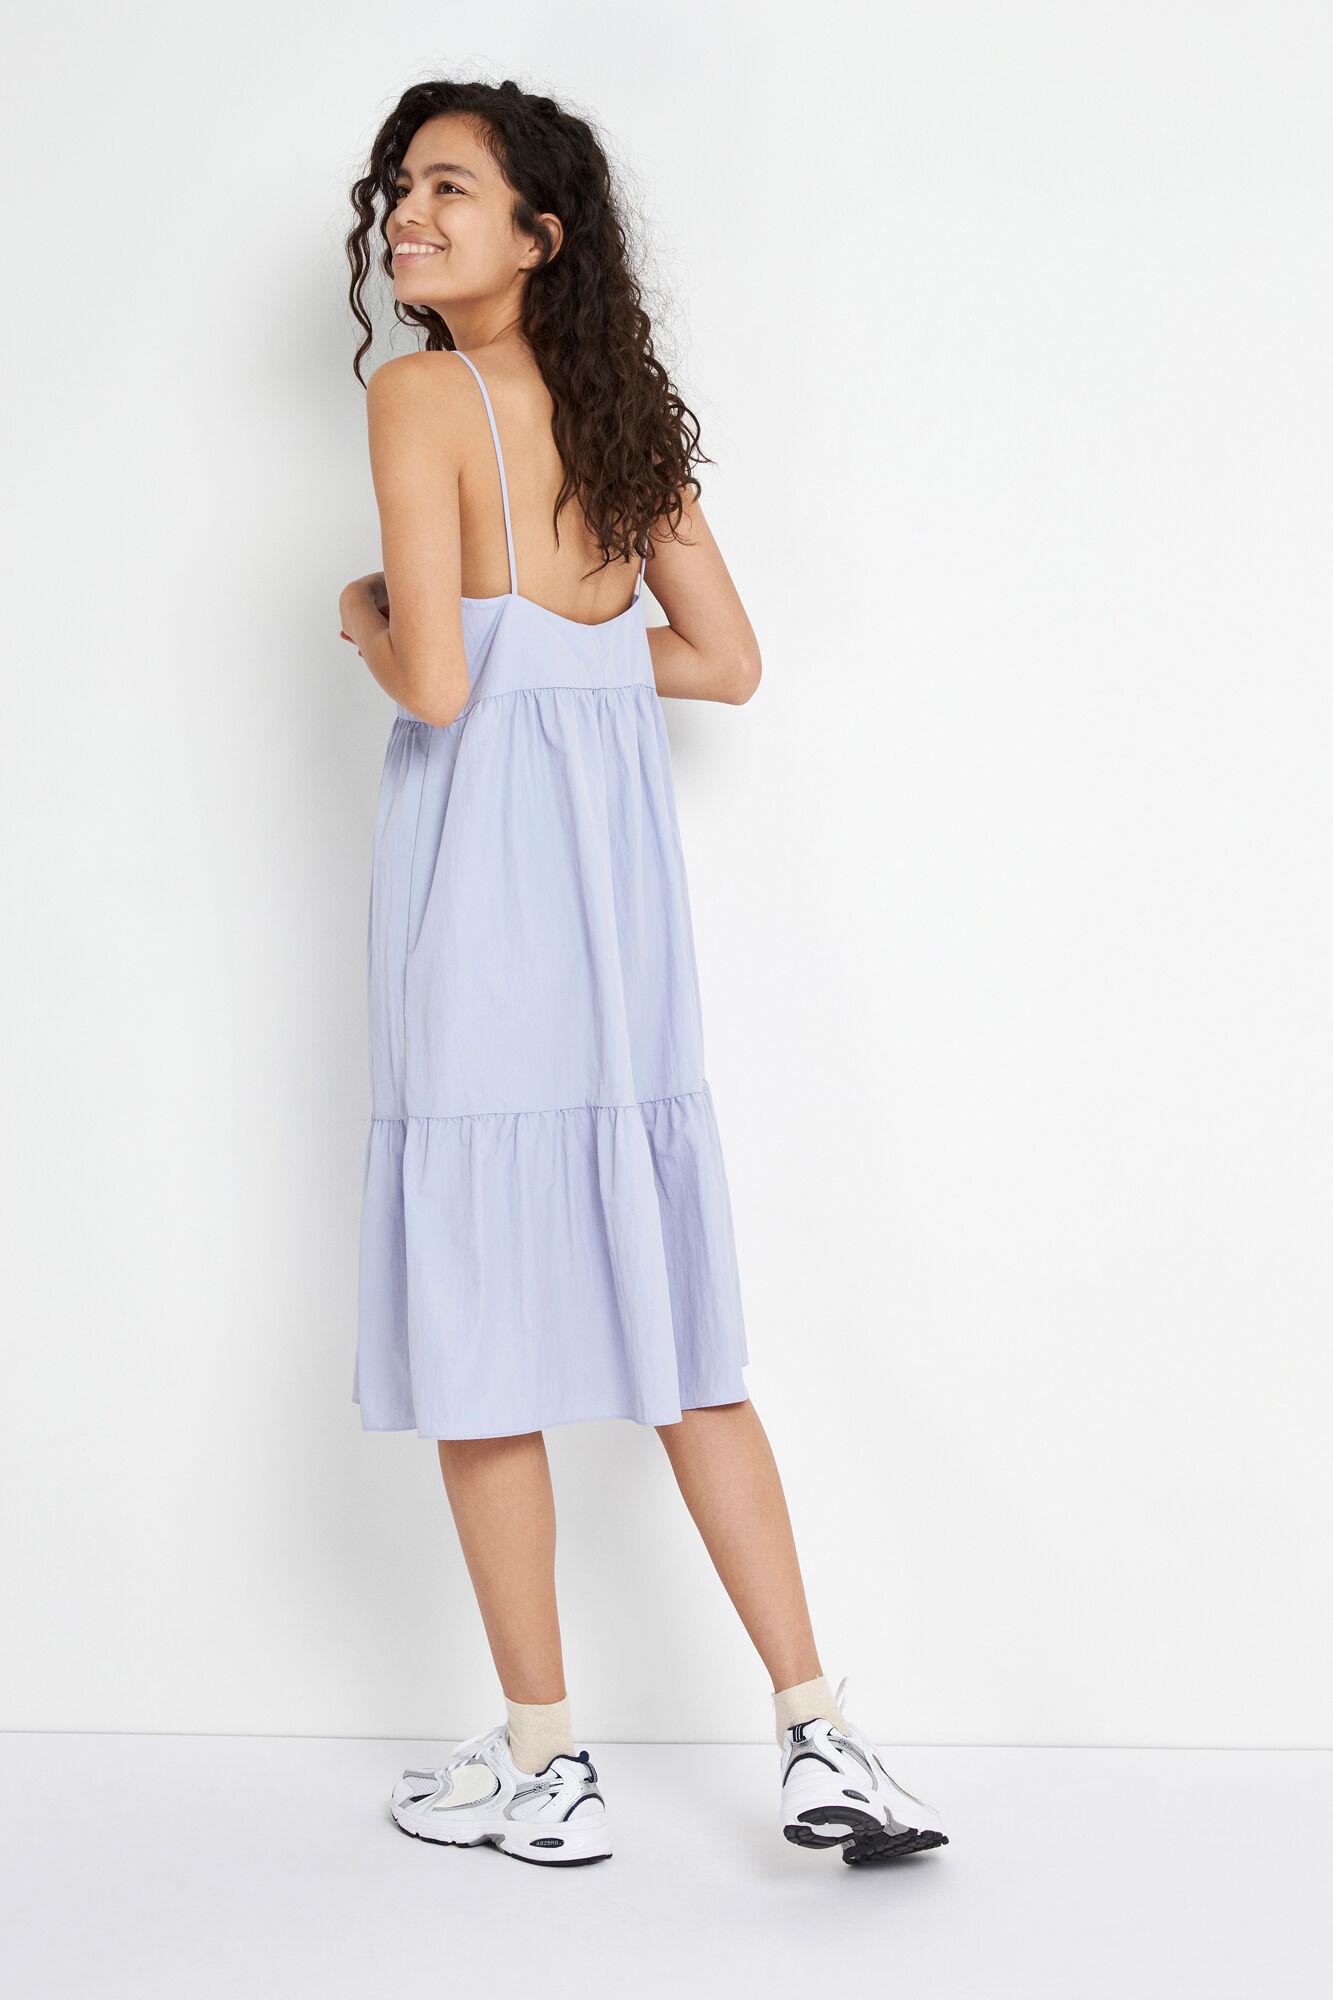 ENKARIN SL DRESS 6729